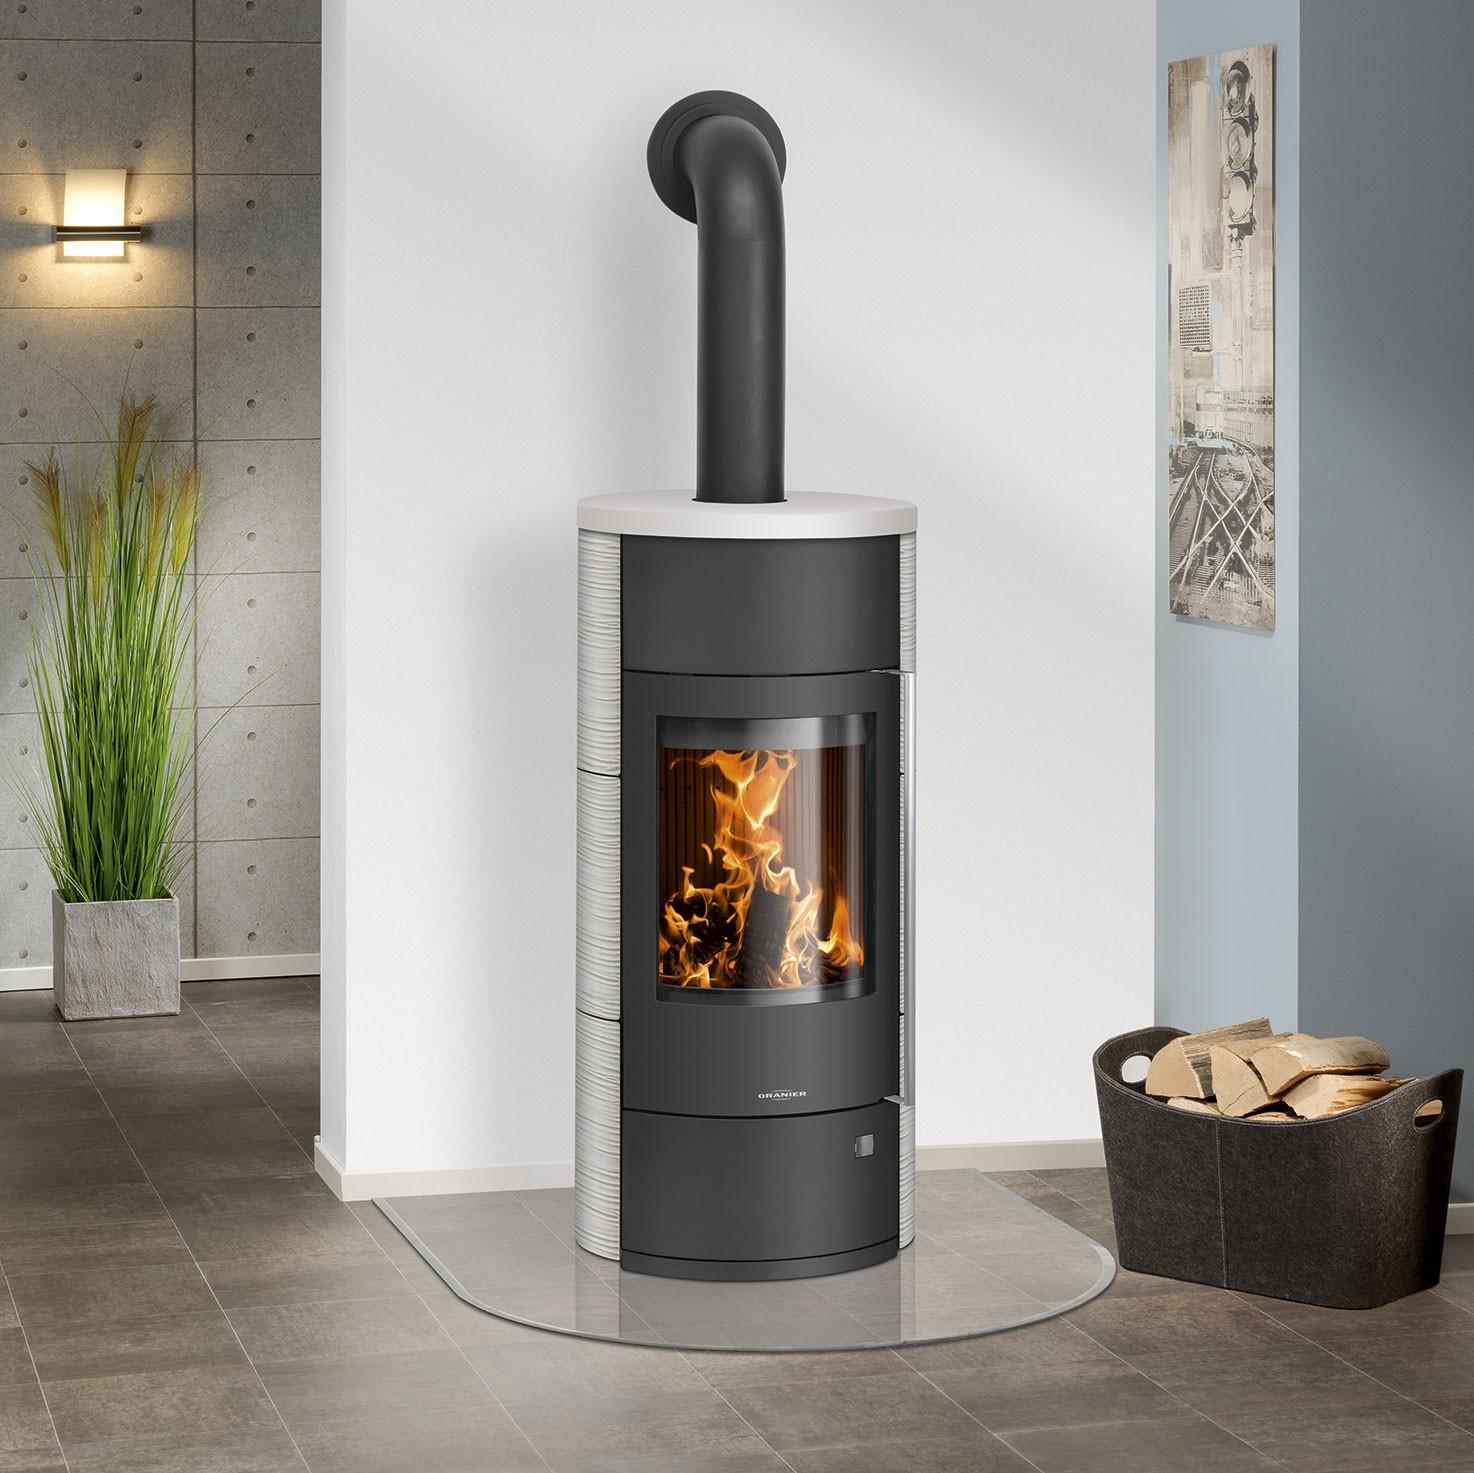 po les bois po les bois b ches hydro polar neo aqua les ma tres du feu chemin e. Black Bedroom Furniture Sets. Home Design Ideas